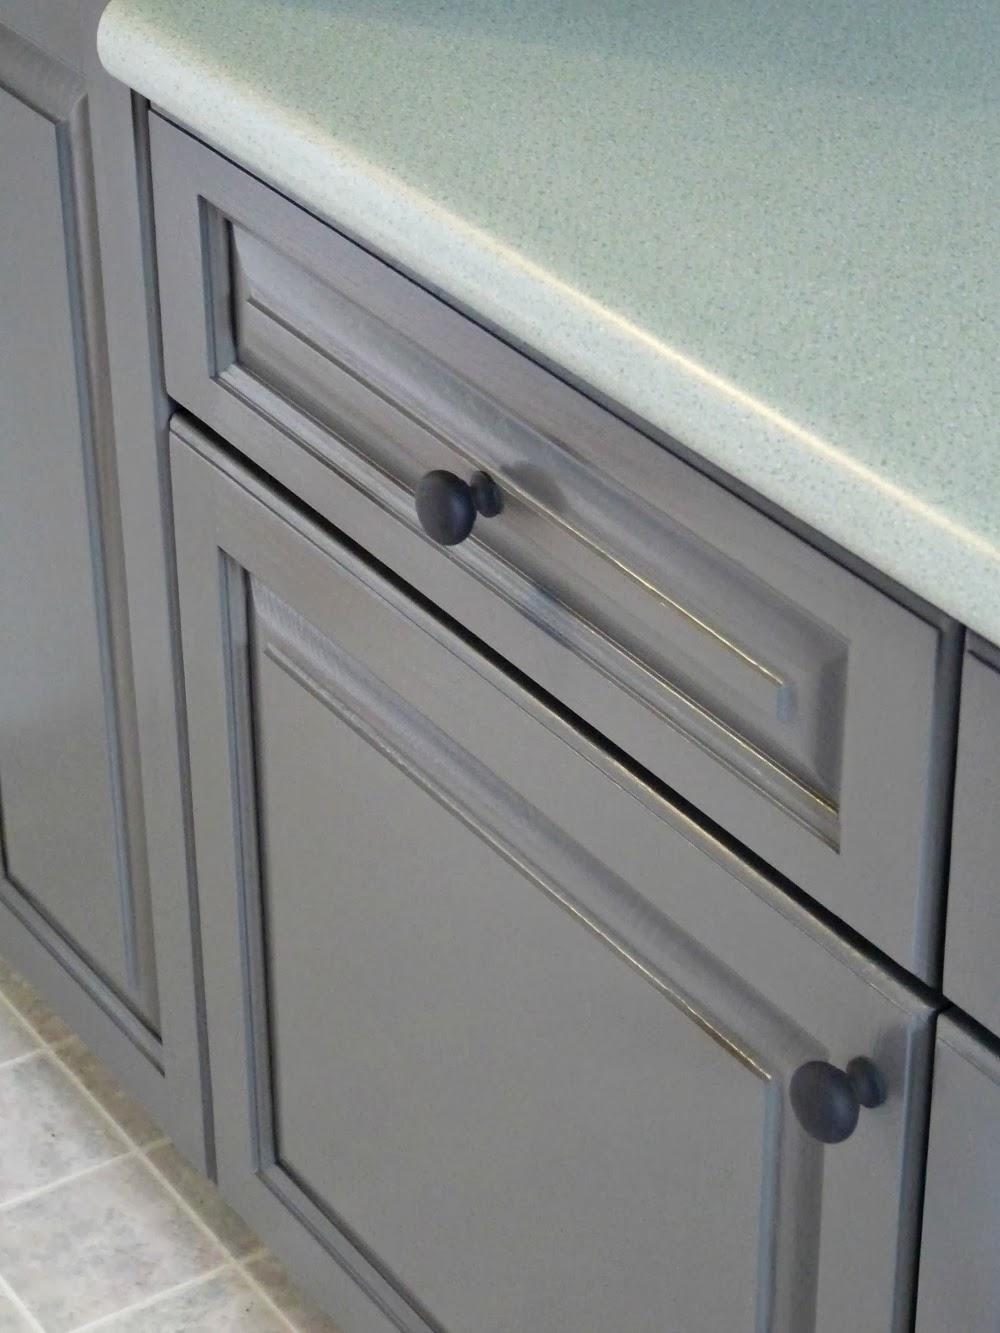 Rust Oleum Products | Rustoleum Cabinet Transformations Protective Top Coat | Rustoleum Cabinet Transformations Reviews